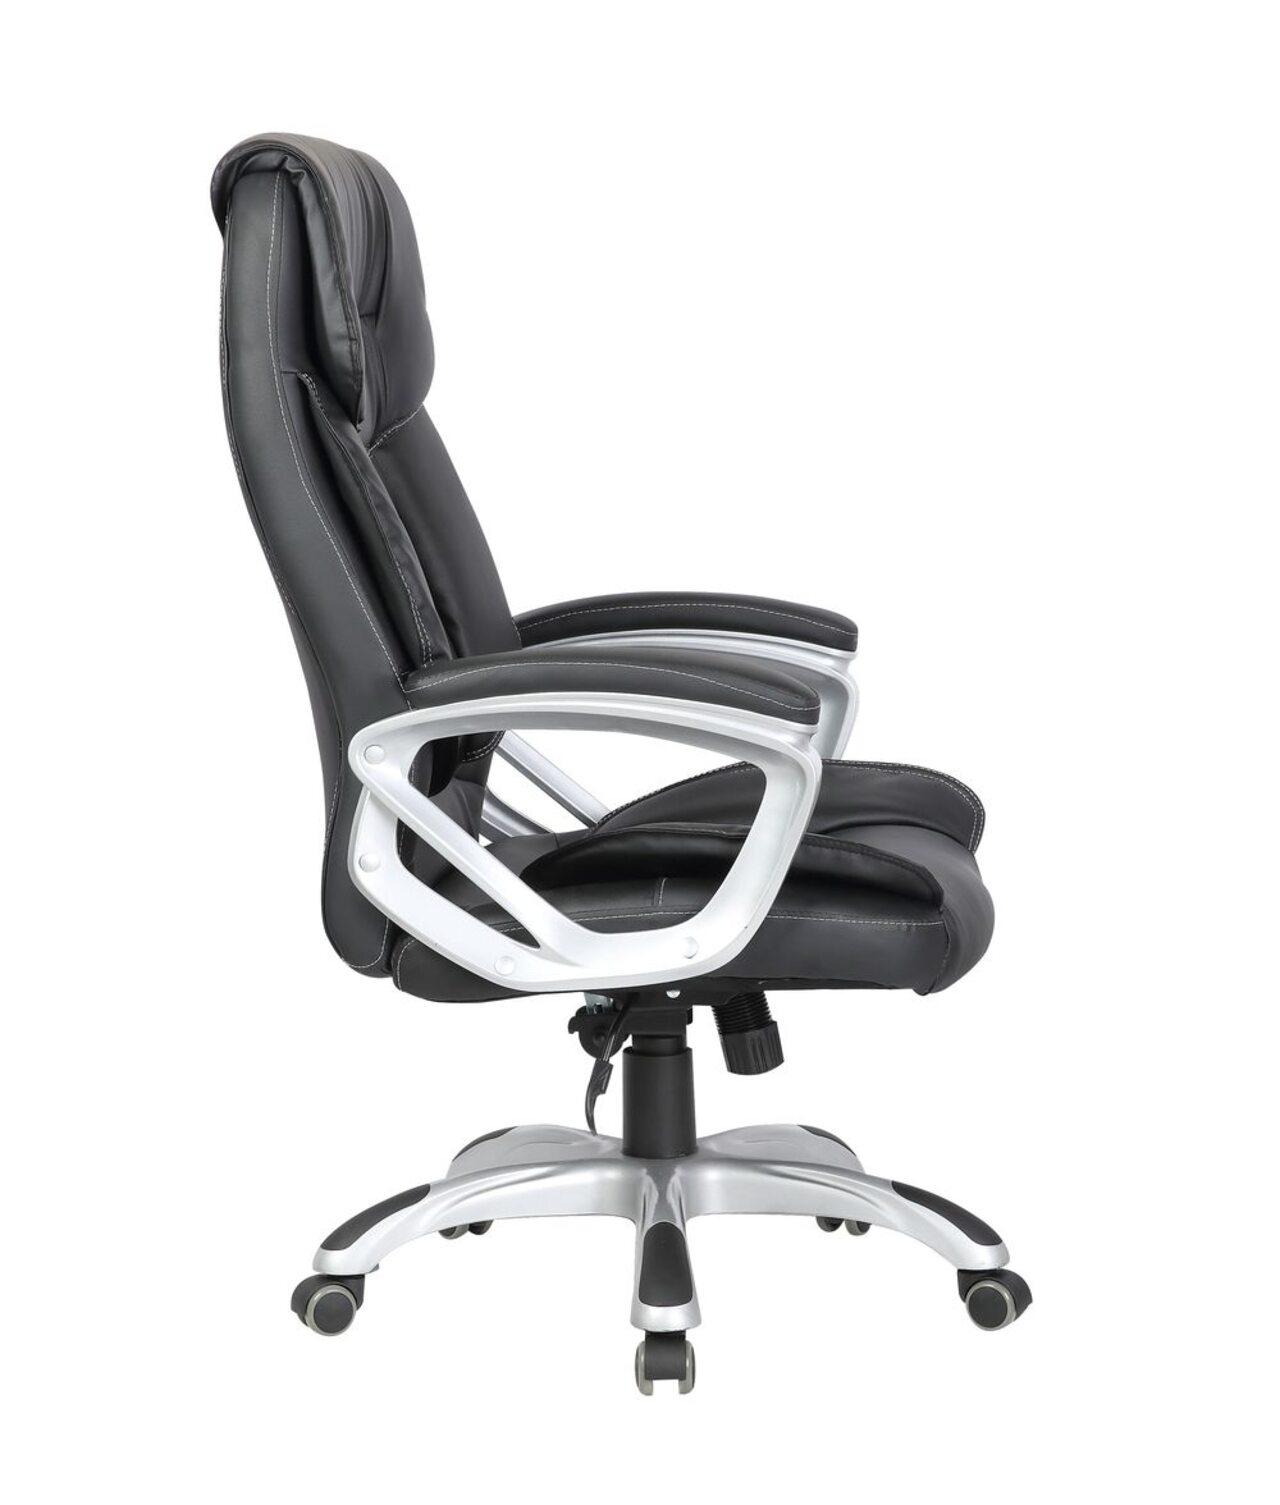 Кресло руководителя College CLG-615 LXH - фото 4